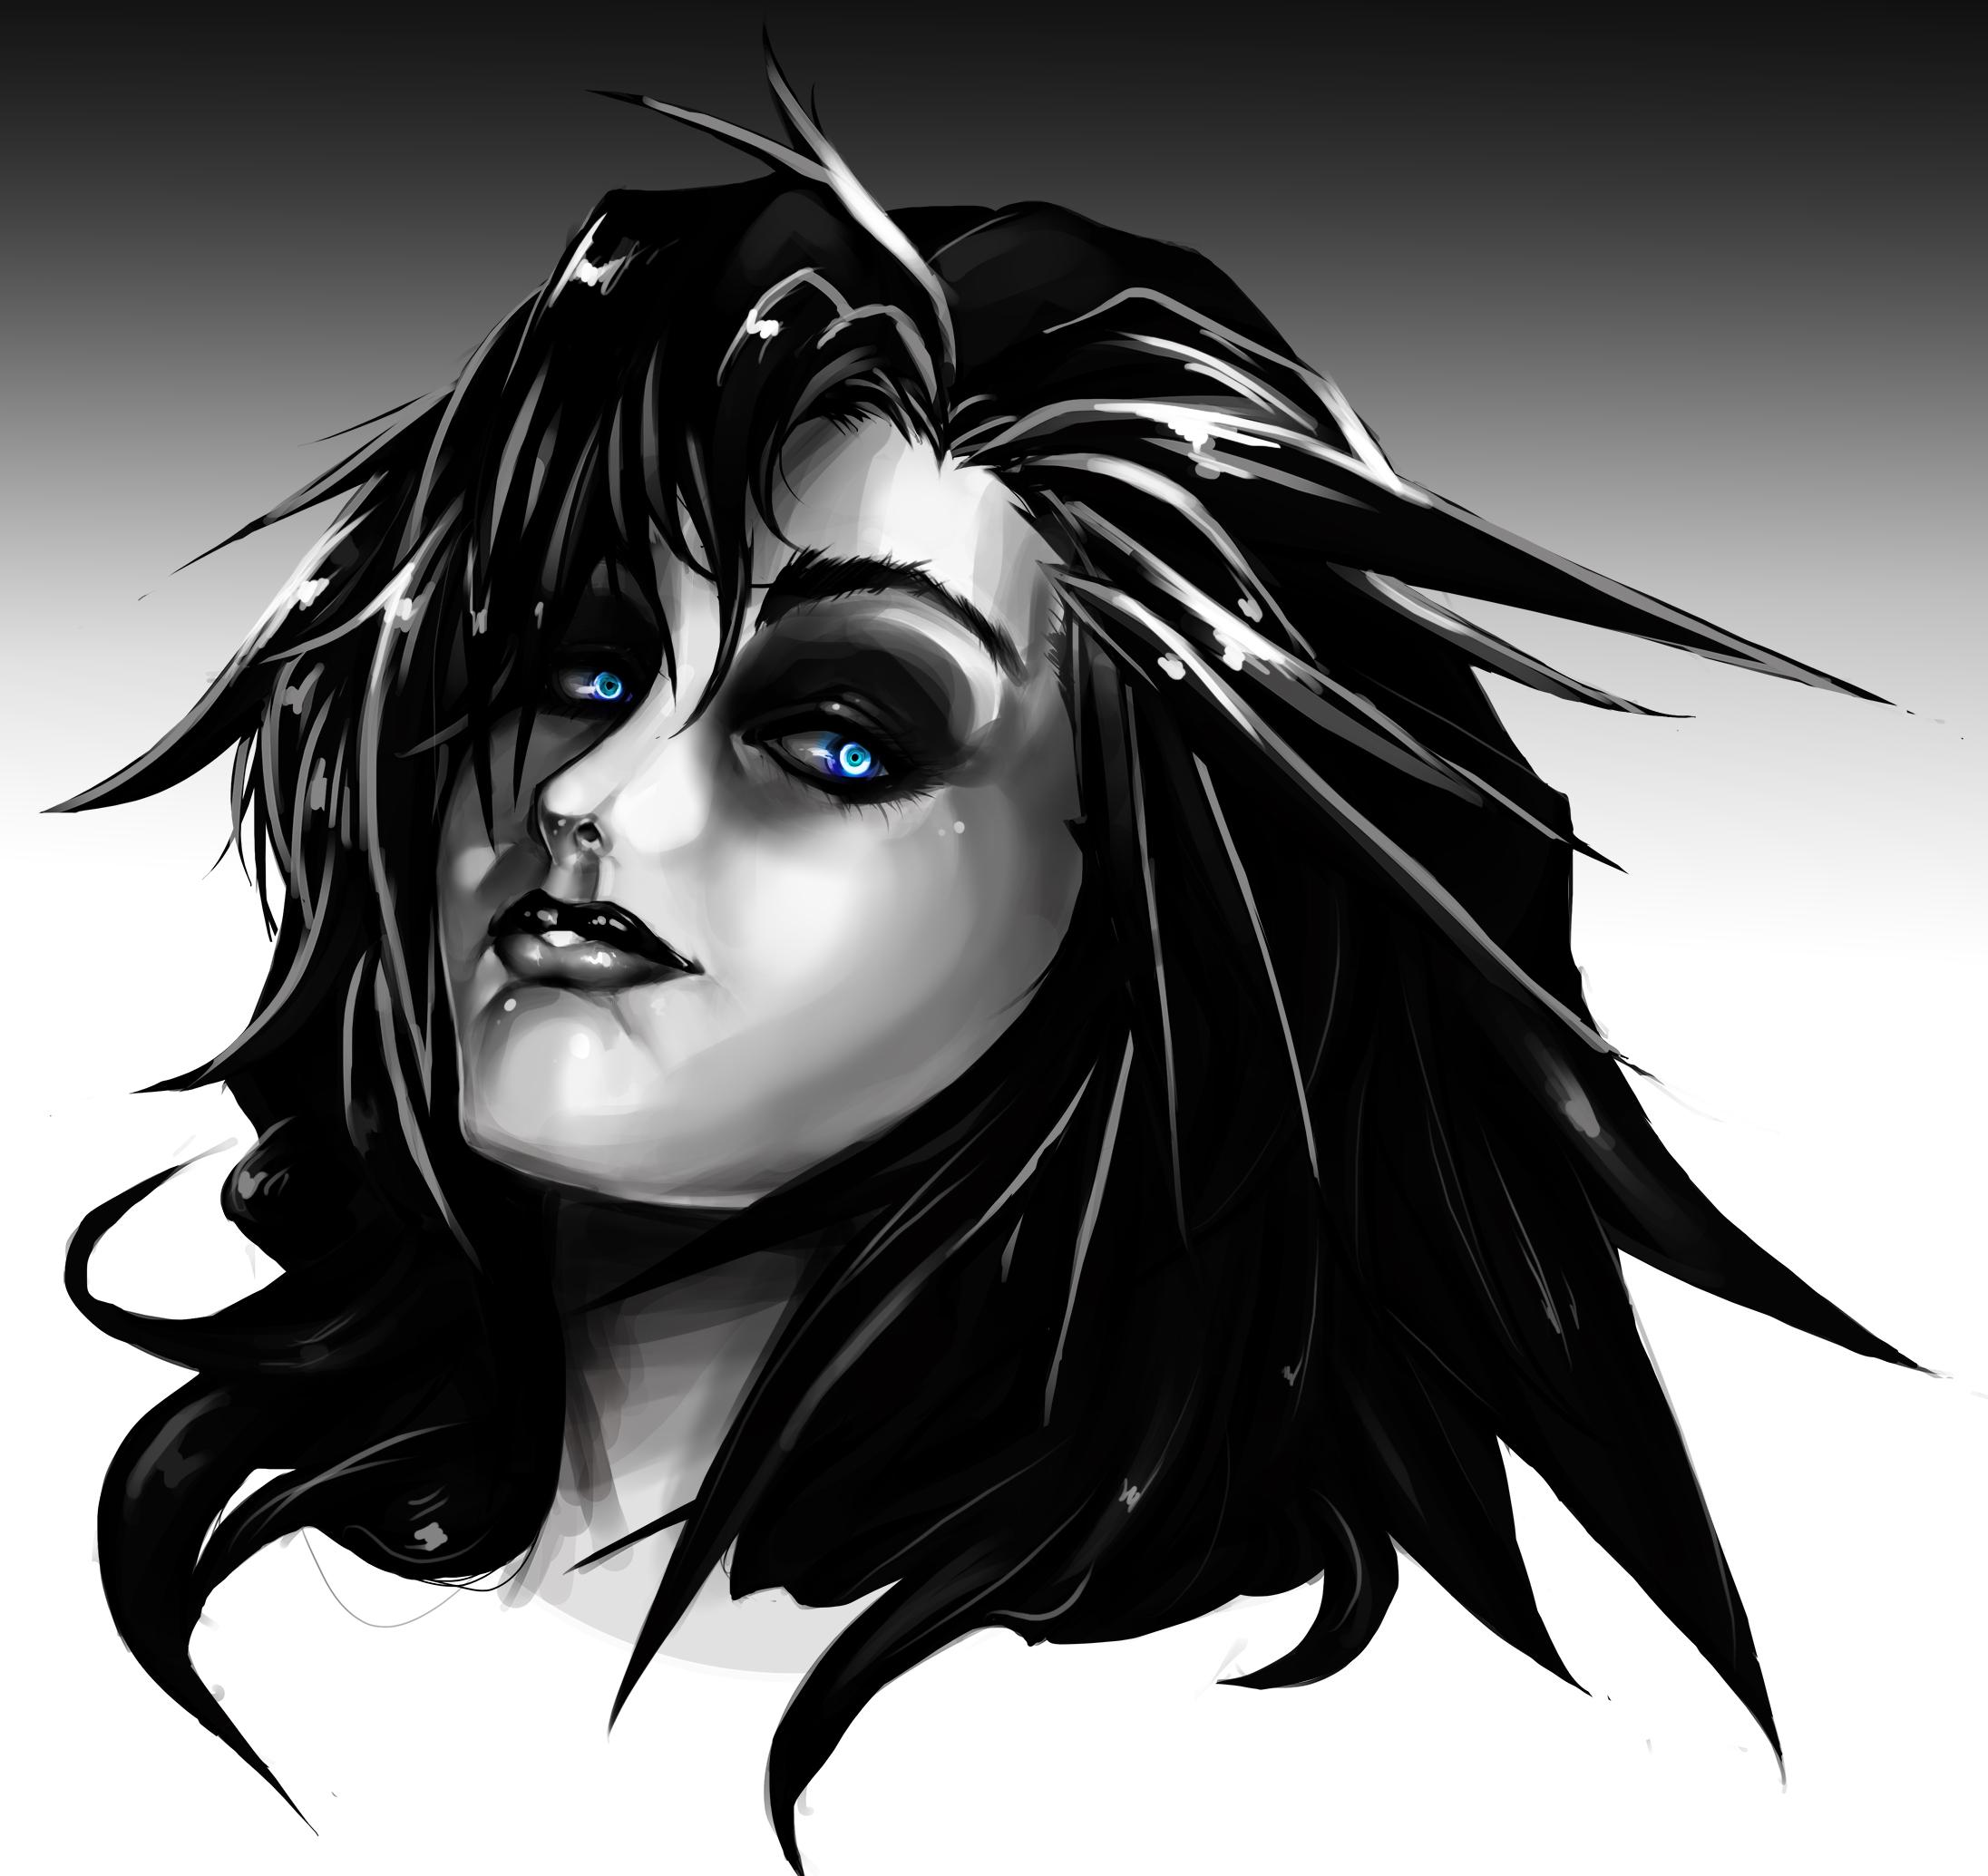 Lady Face